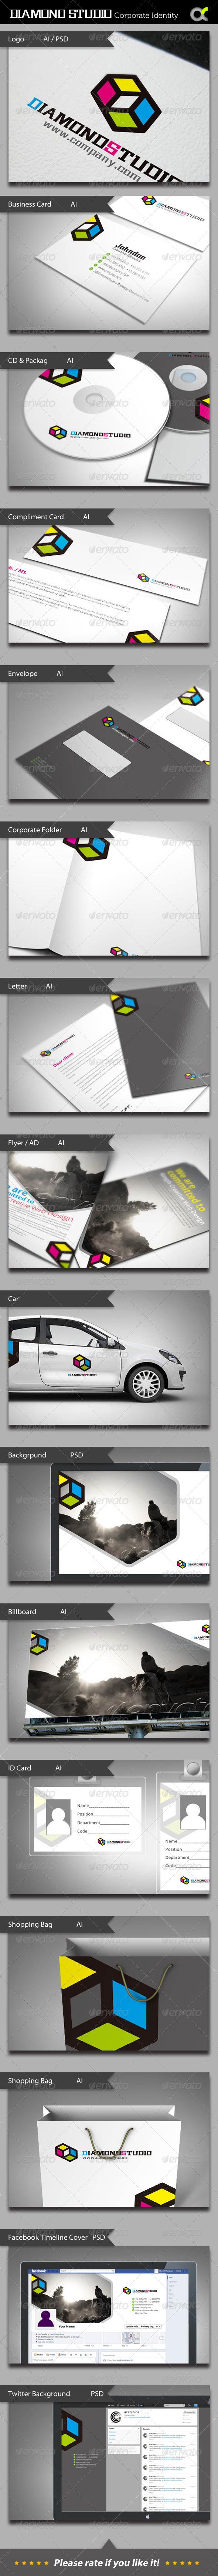 Diamond Studio Corporate Identity - Stationery Print Templates